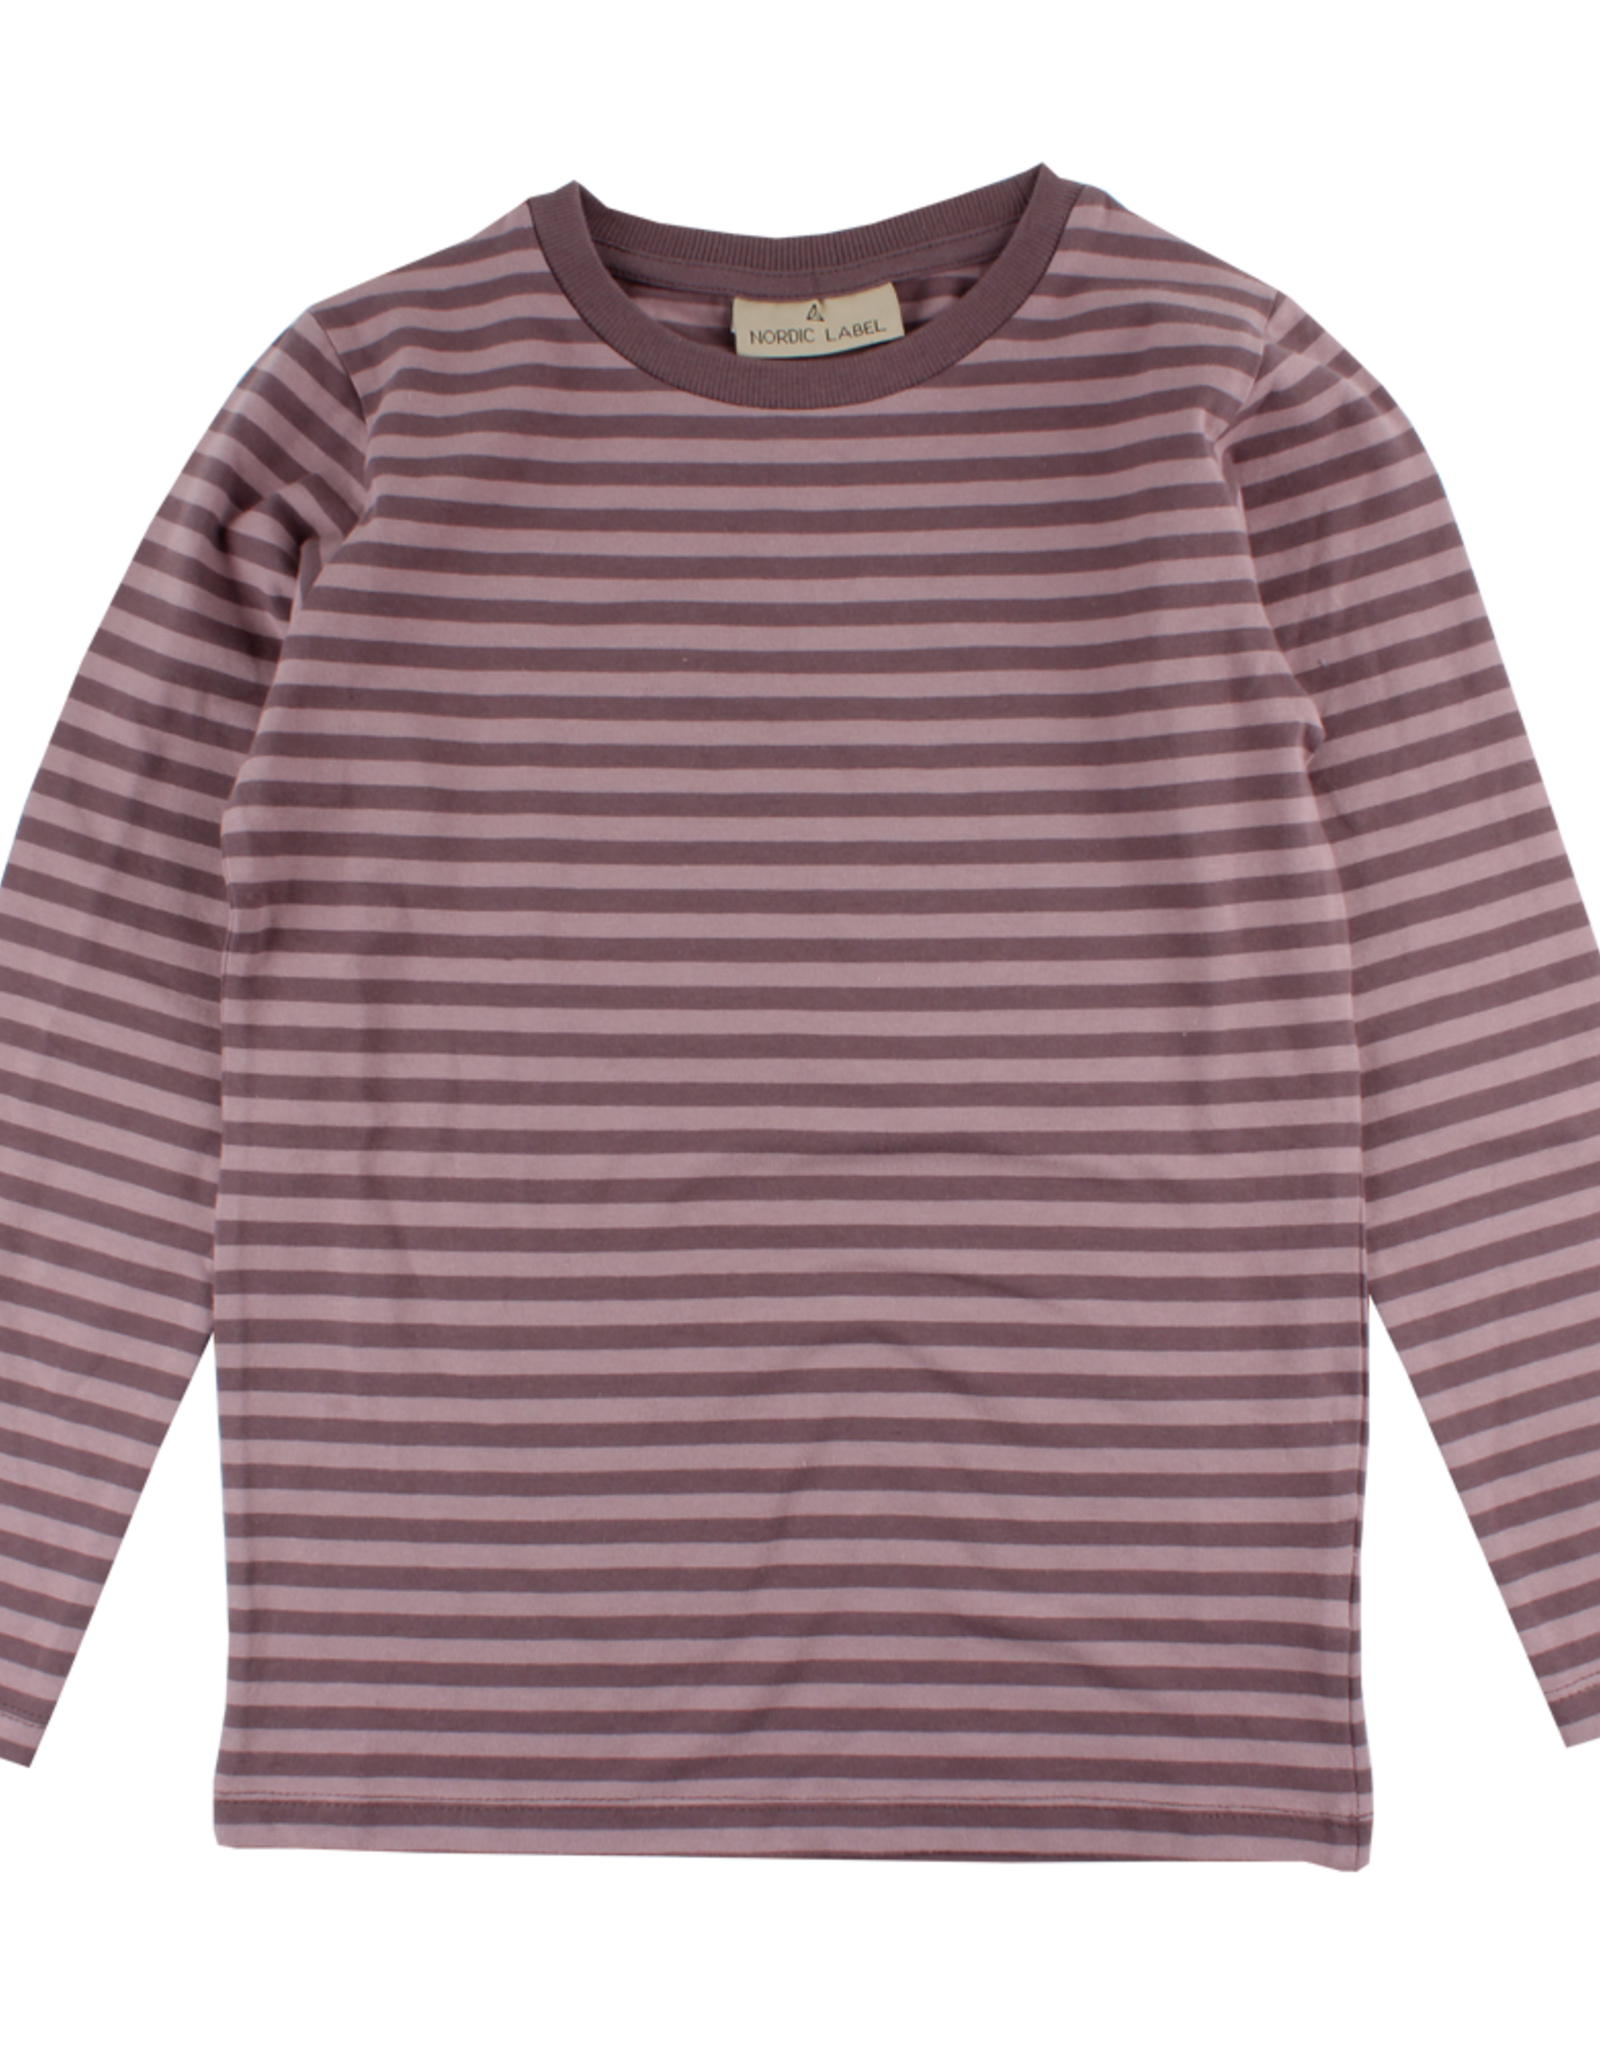 Nordic Label Long Sleeved Tee